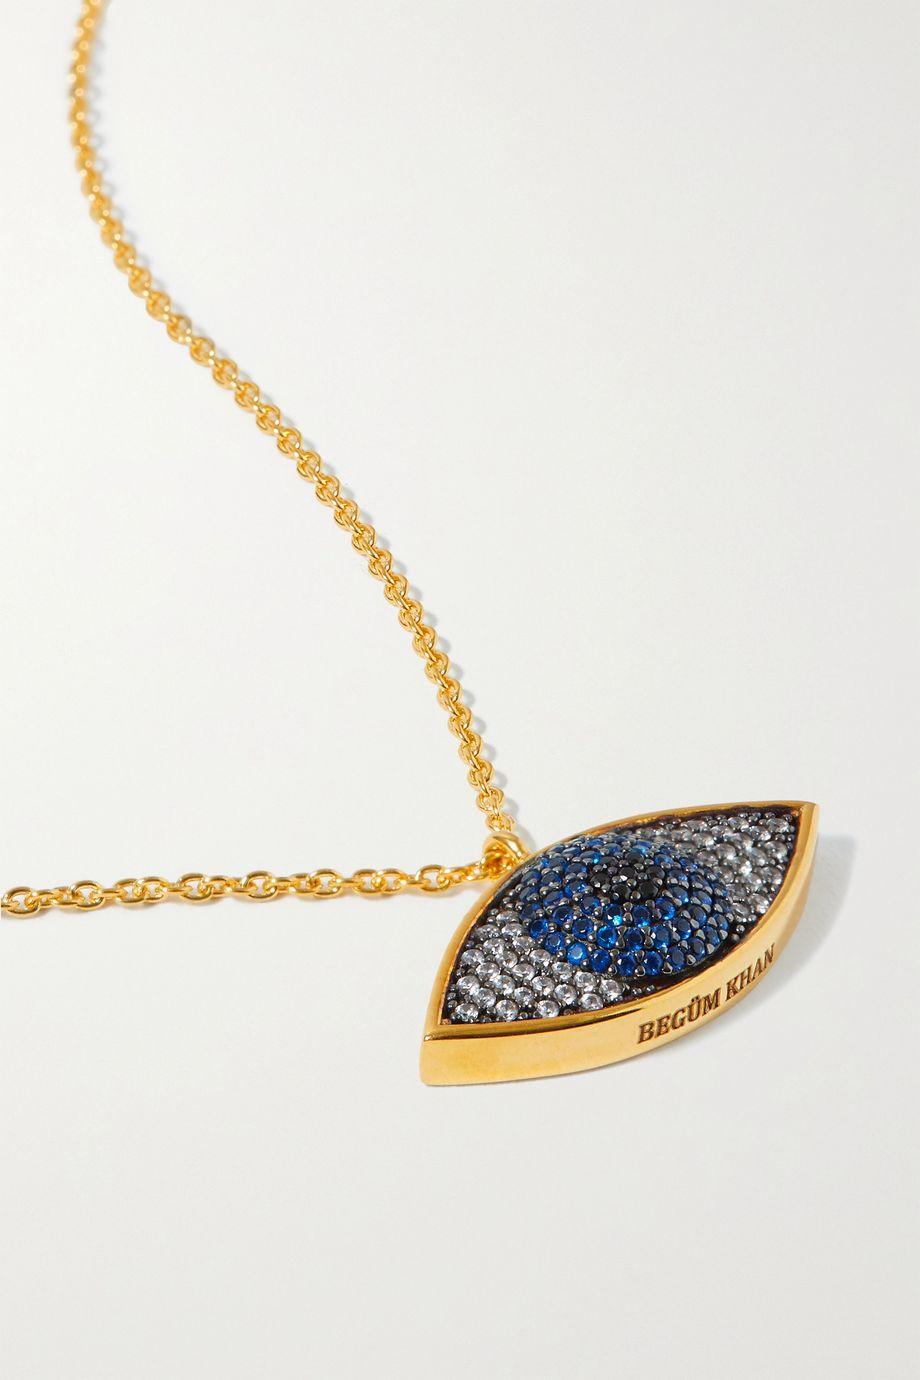 Begüm Khan Nazar gold-plated crystal necklace